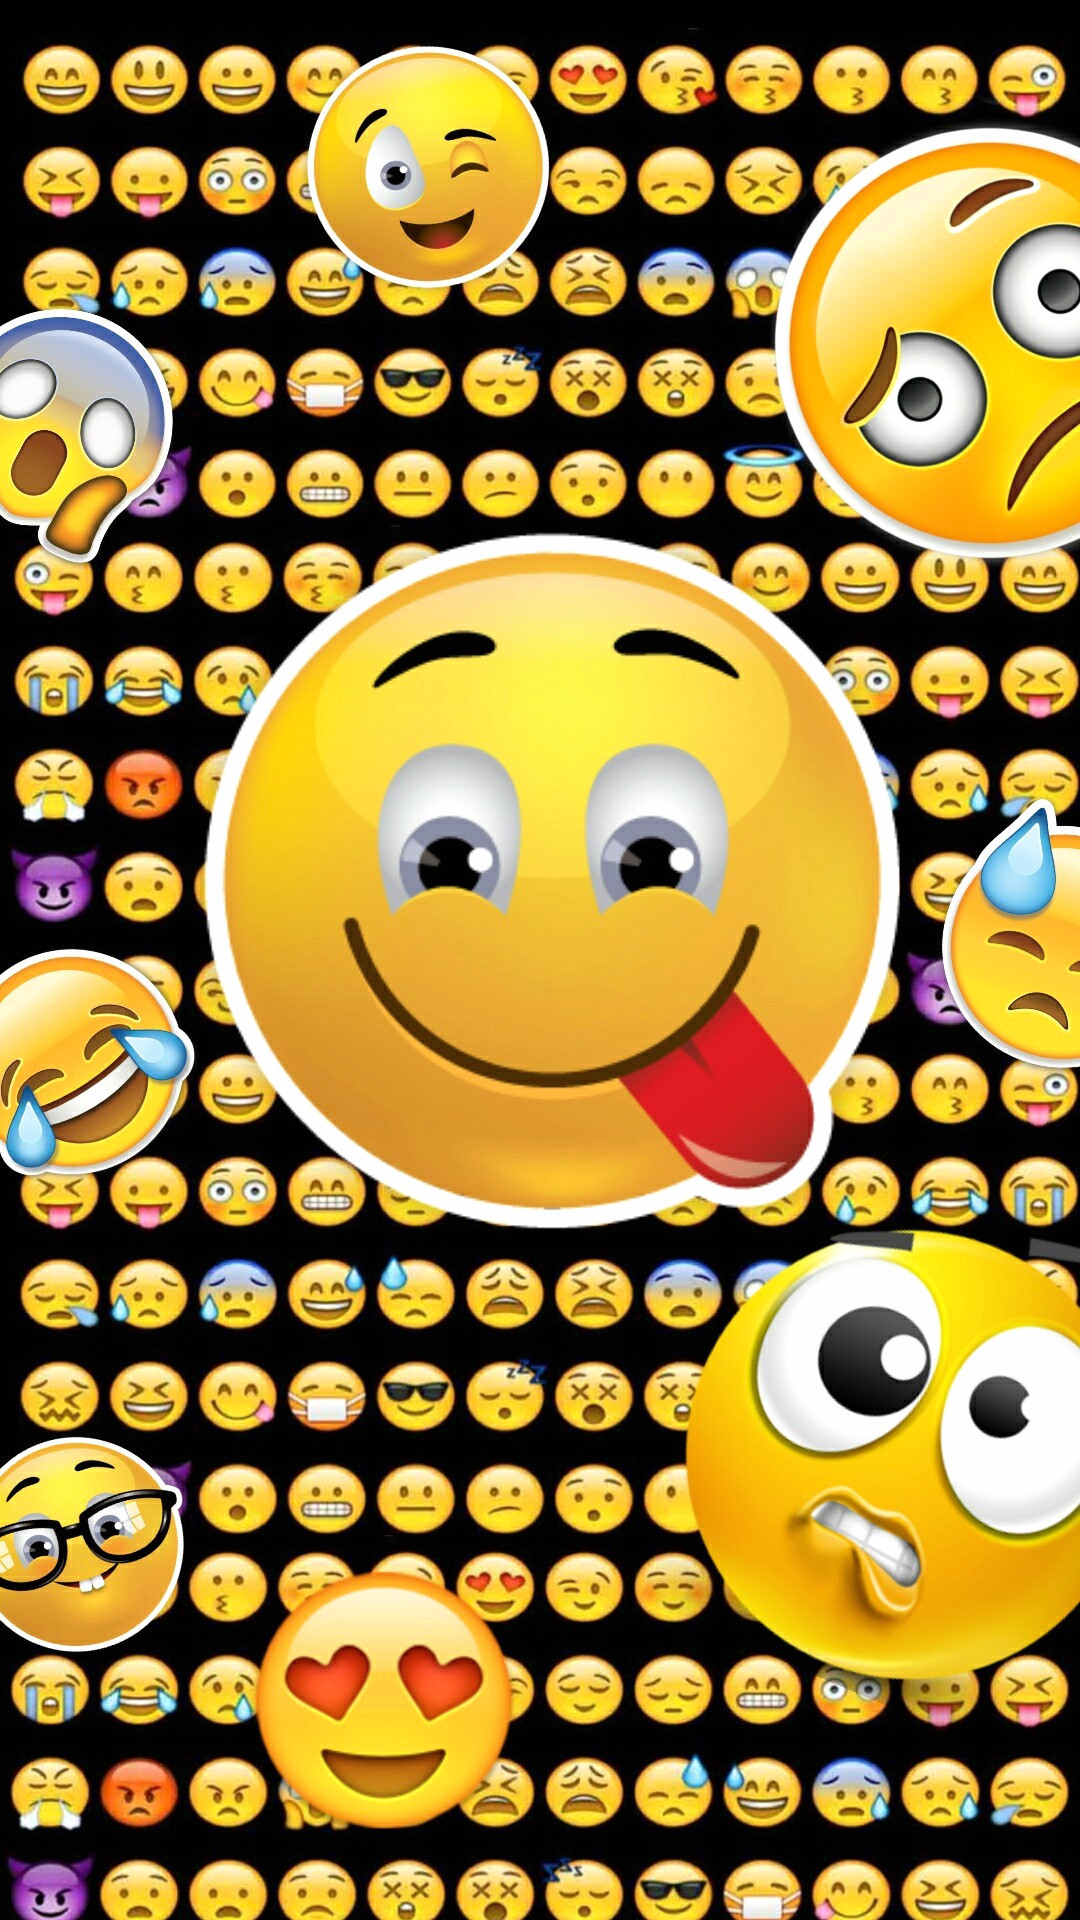 Free download 63 Cute Emoji Wallpapers